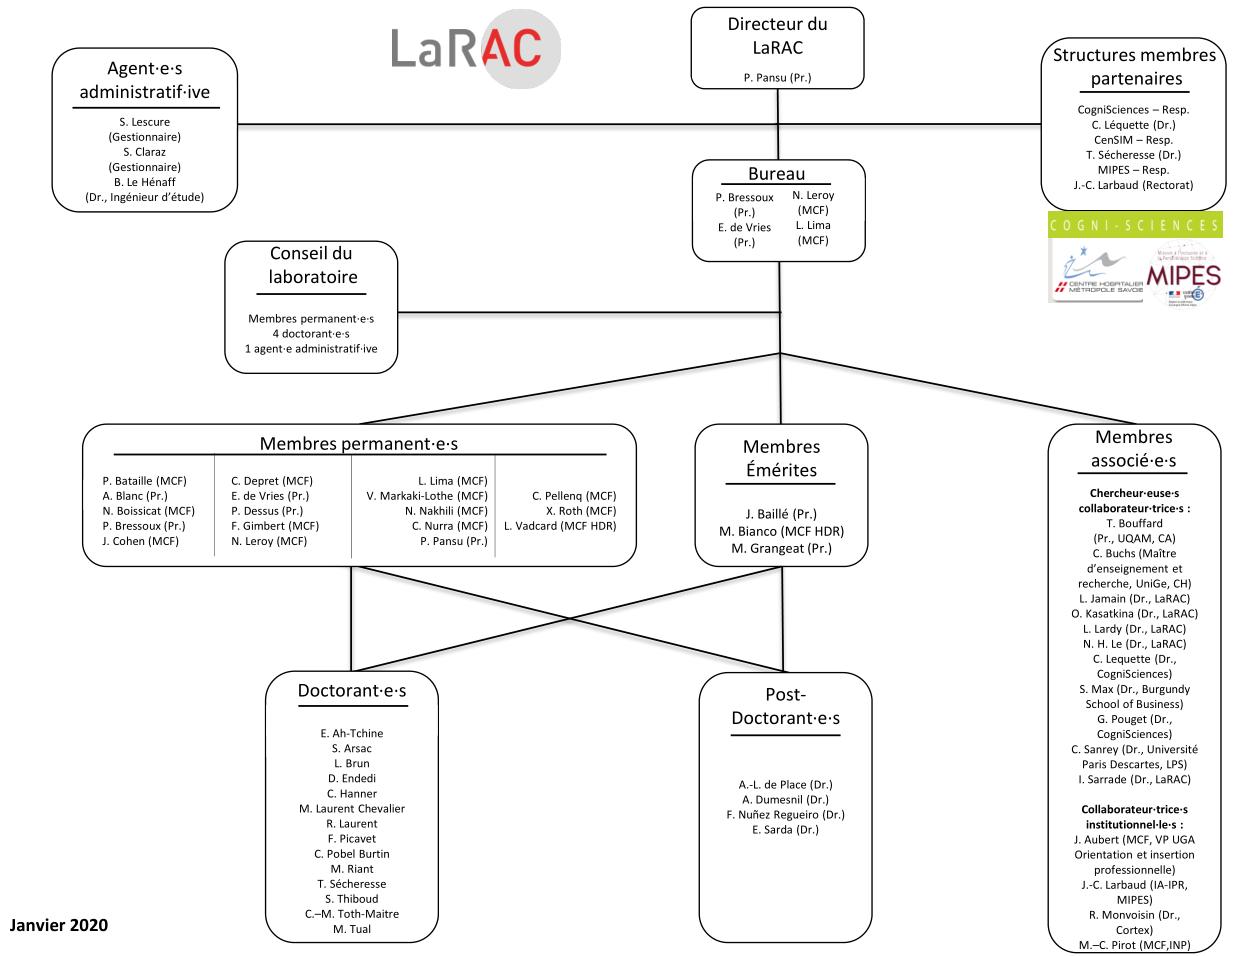 organigramme_larac_01-2020.png